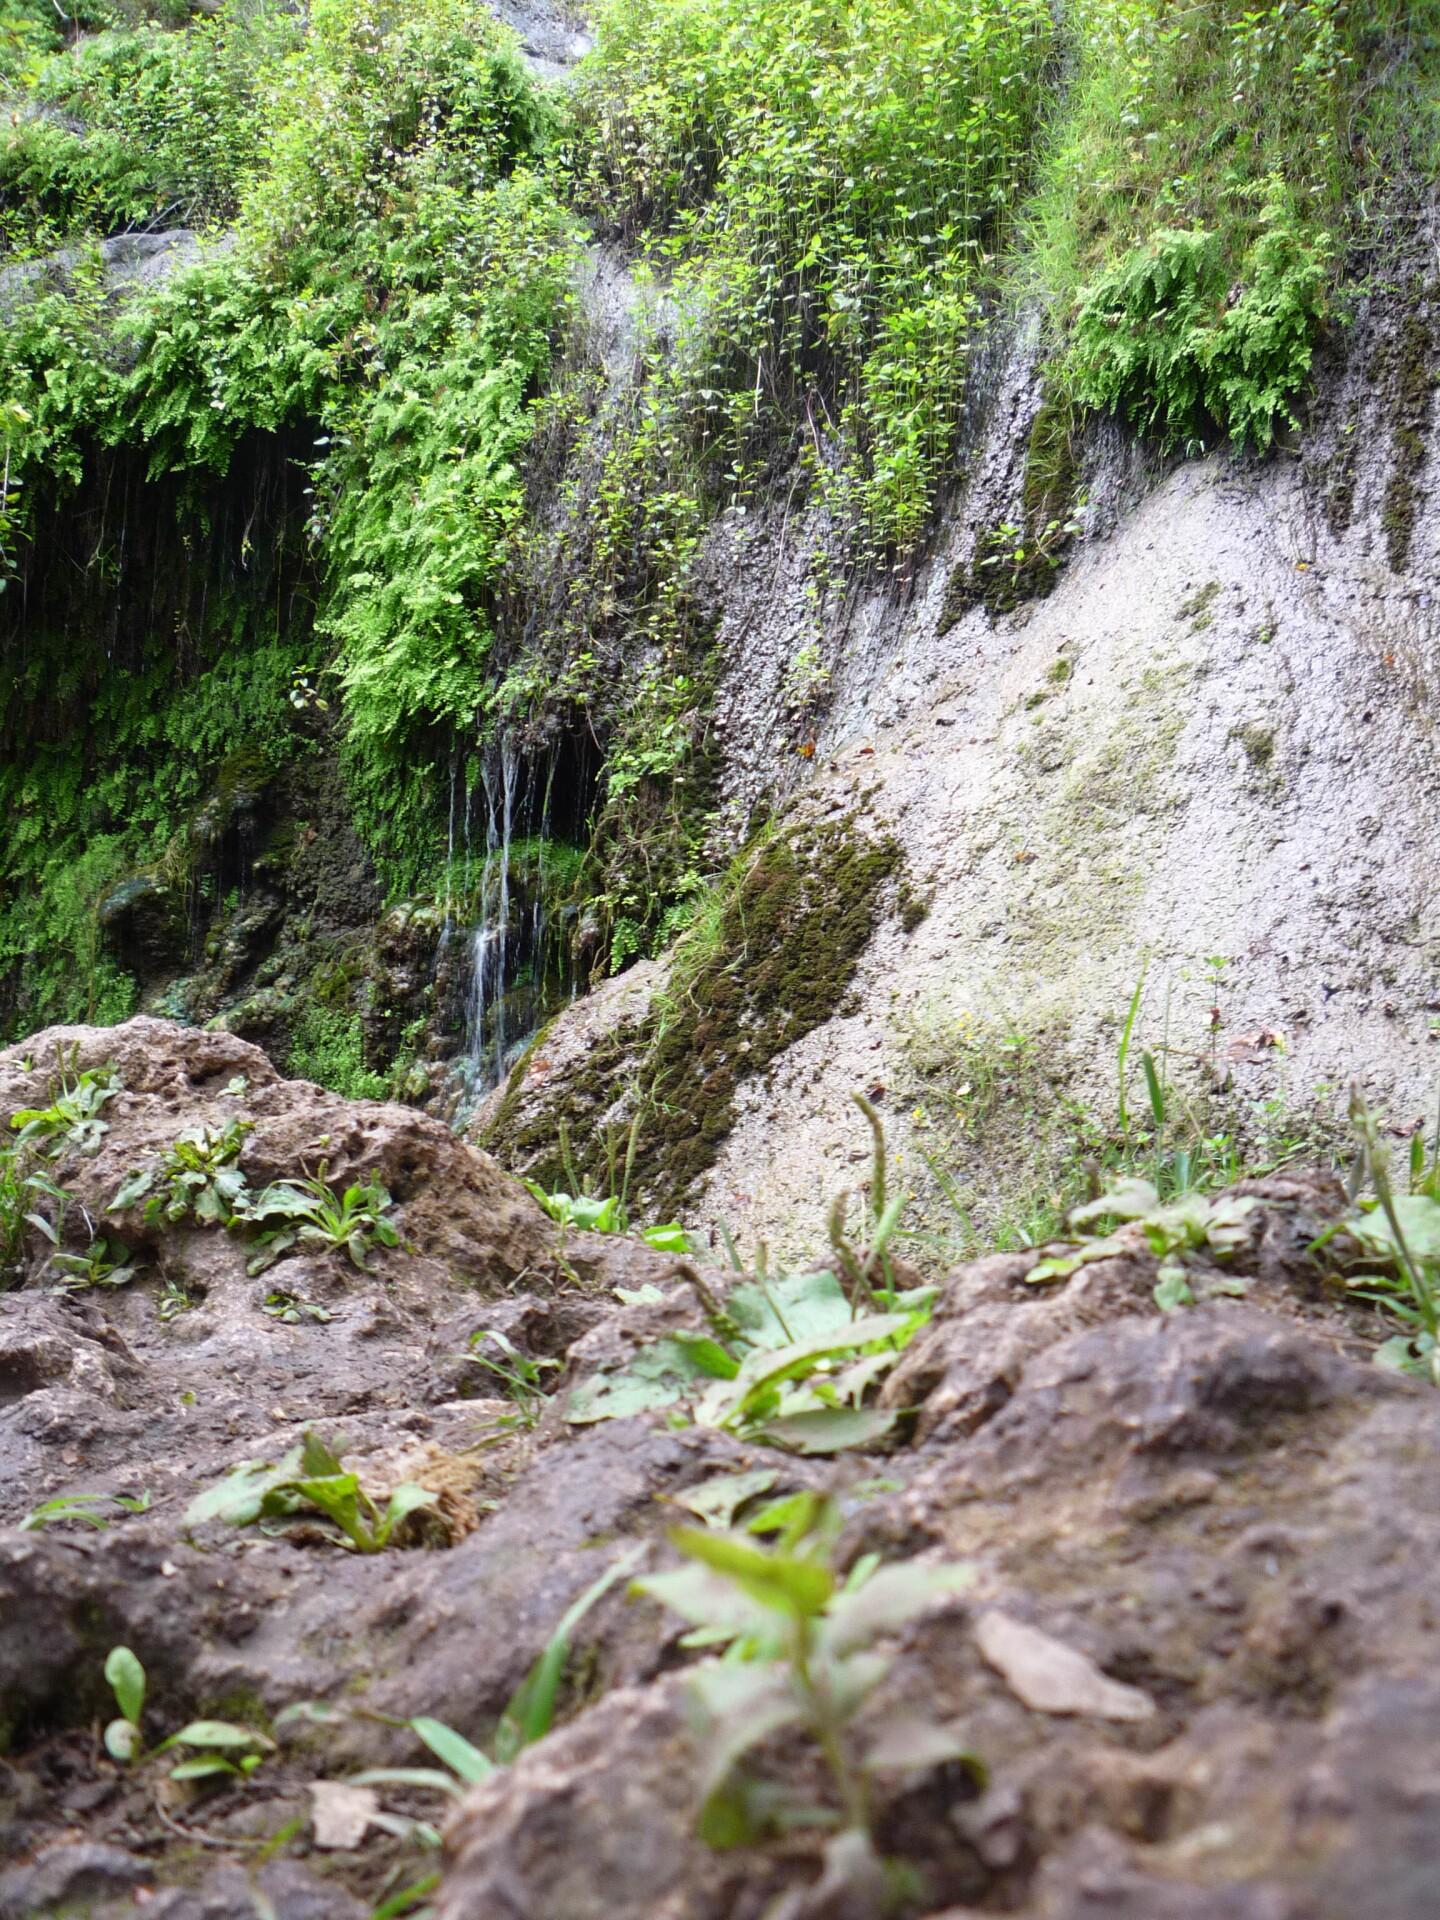 The lower falls at the end Escondido Canyon Park and Falls accessed via the four-mile round-trip hike through oak woodland, riparian woodland and coastal sage scrub habitats.